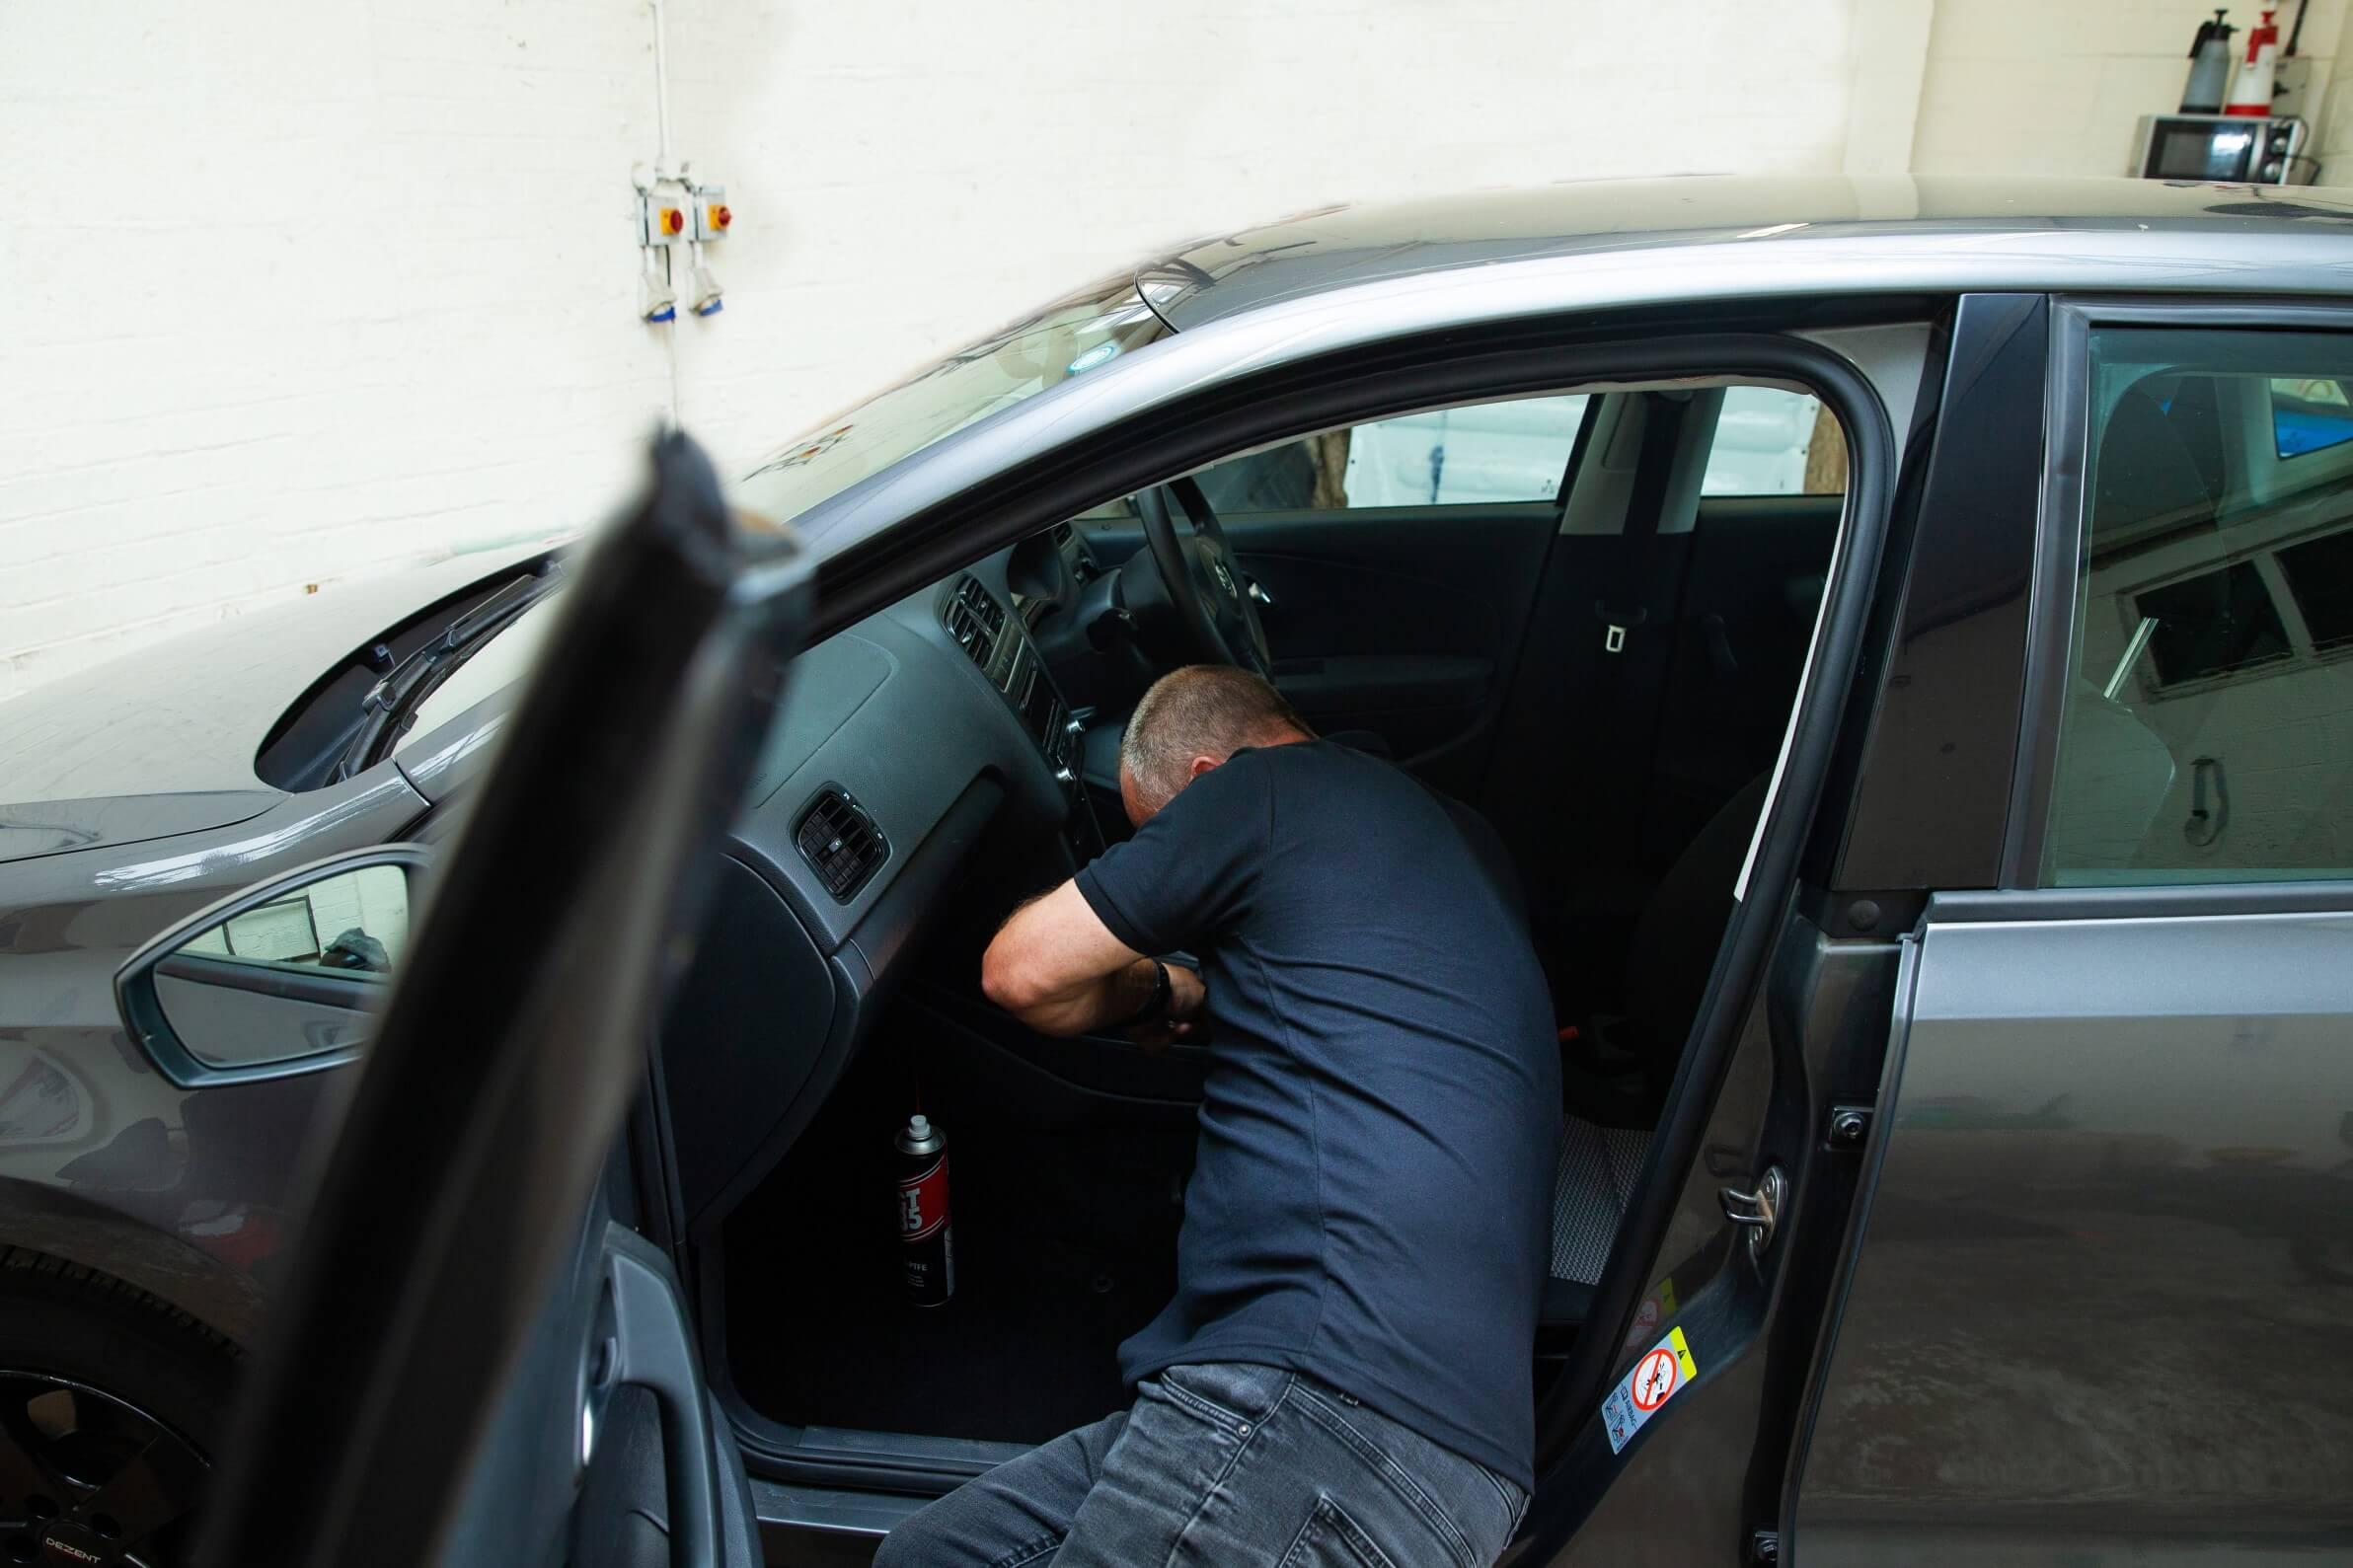 Vehicle Checks Underway - Gold Cars Ltd